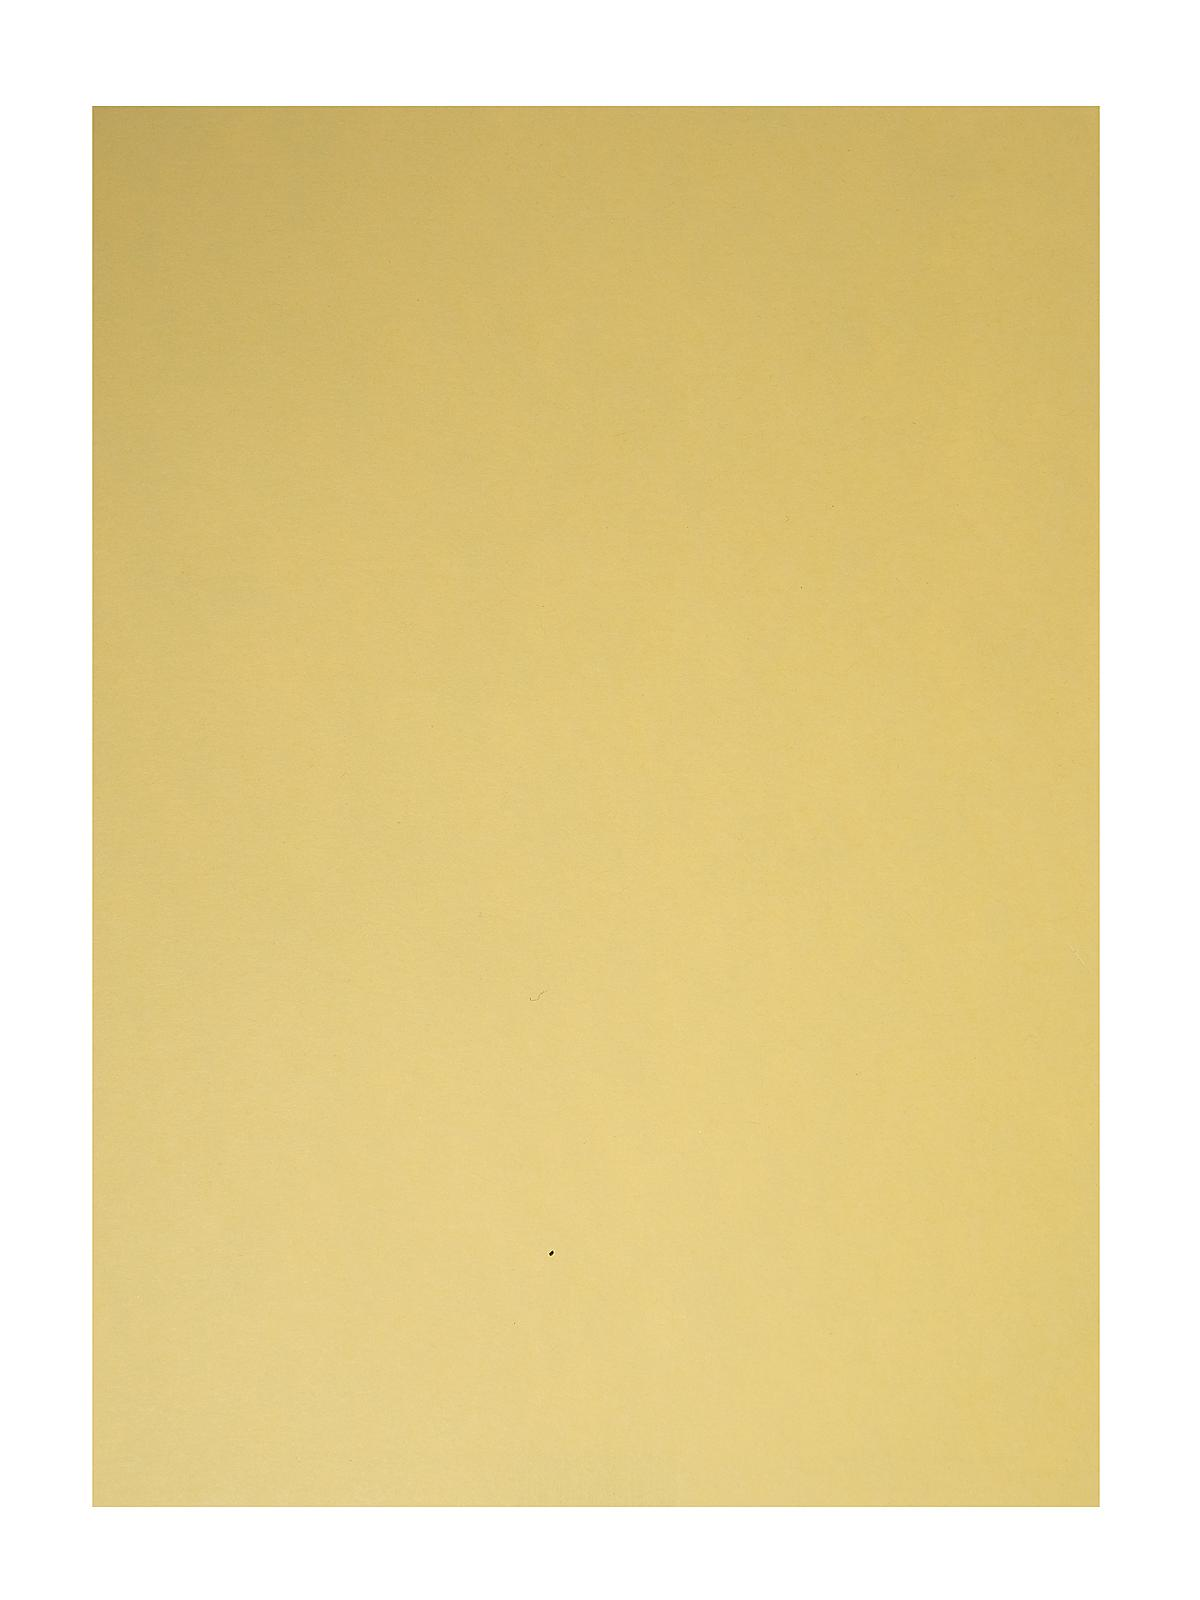 Classic Cardstock 8 1 2 In. X 11 In. Sunflower Sheet